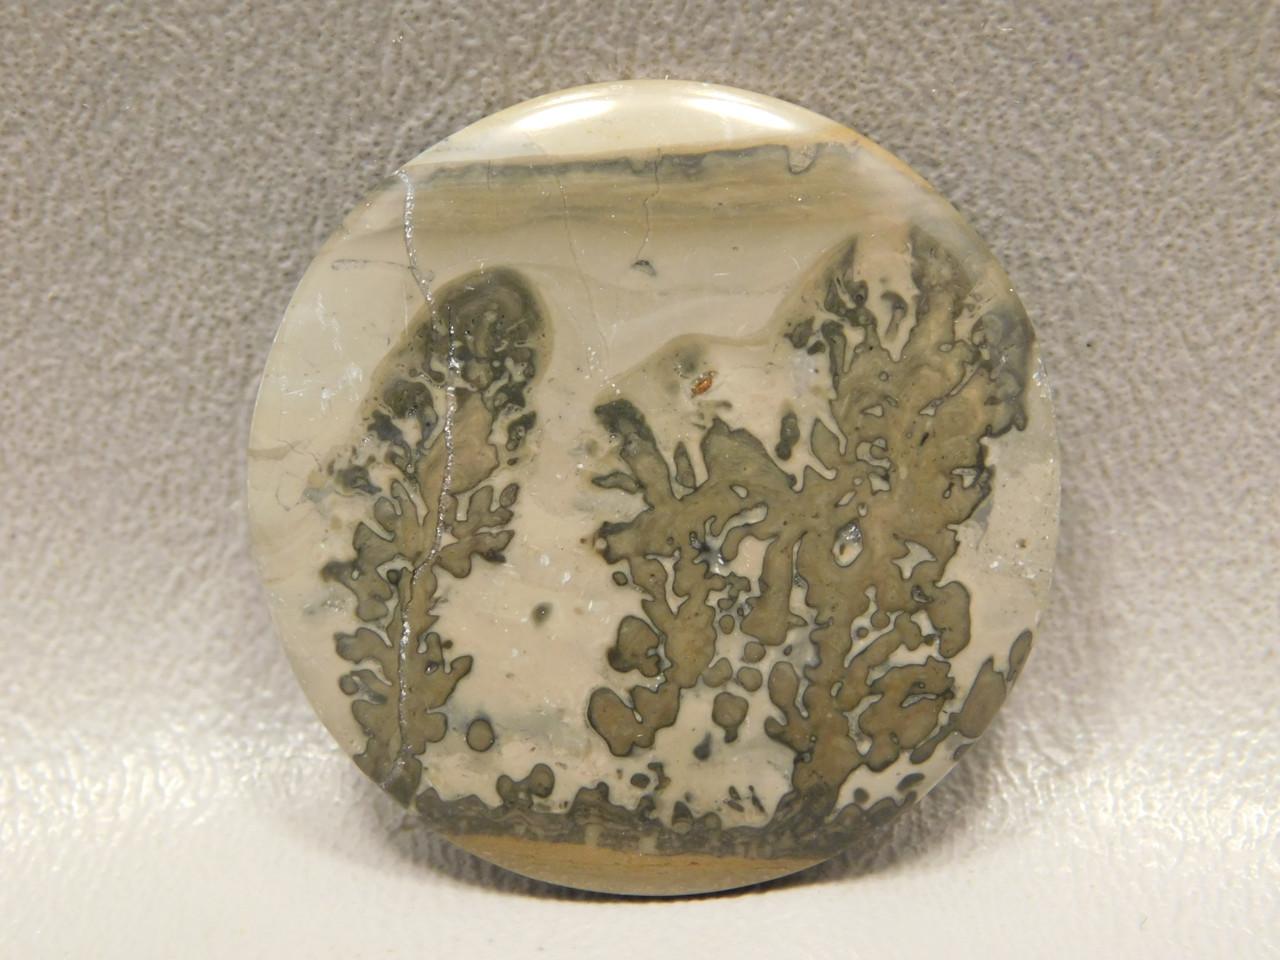 Cotham Marble Fossil Stone Cabochon Jewelry Designer Gemstone #8